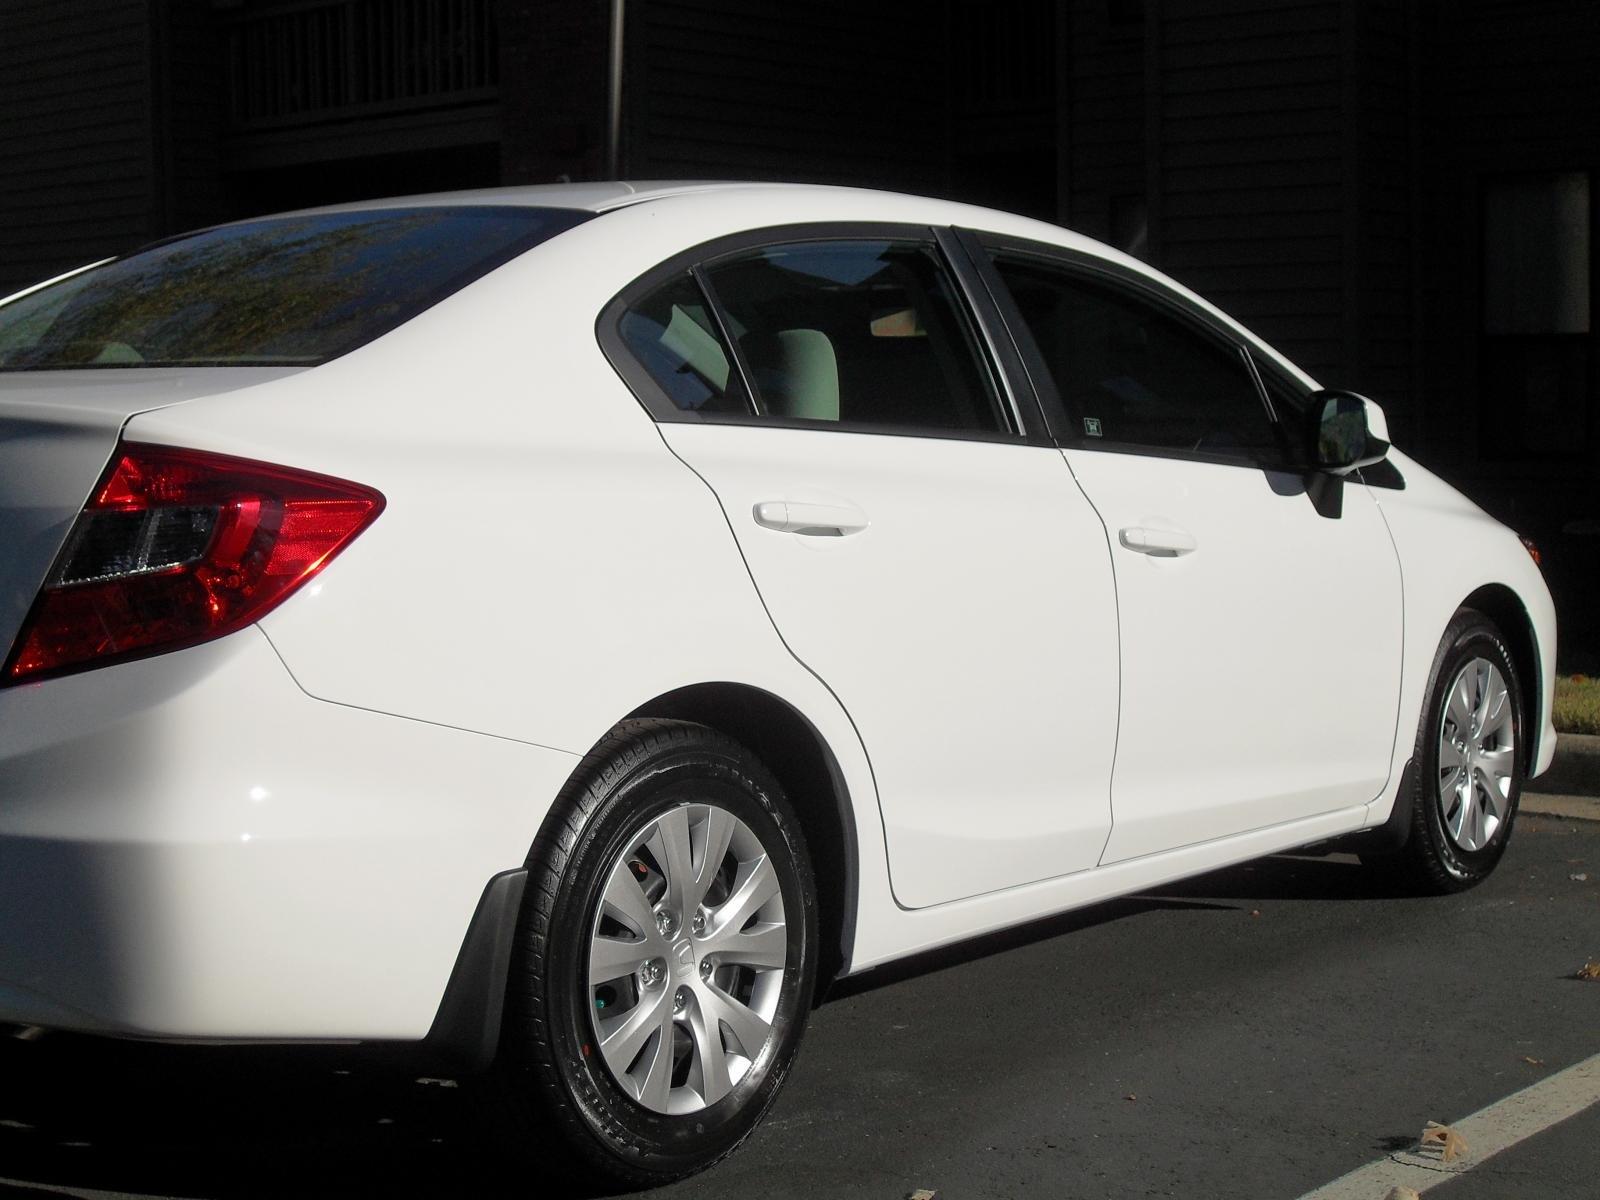 Dutsguru Build 2012 Honda Civic Lx Sedan White 9th Gen Civic Forum